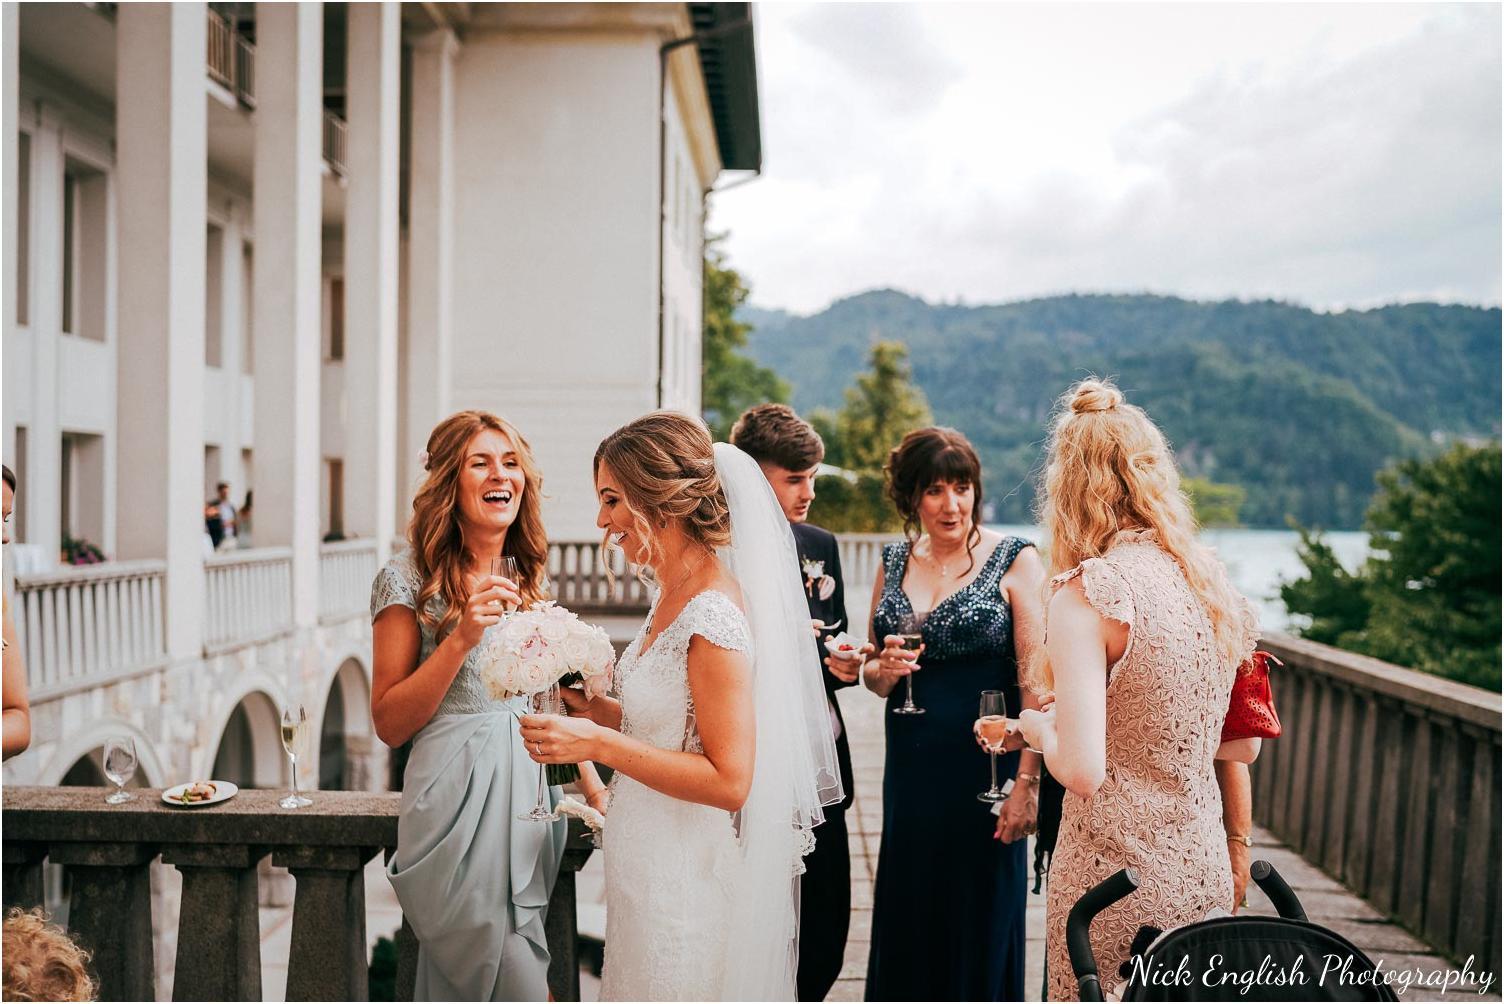 Destination_Wedding_Photographer_Slovenia_Nick_English_Photography-66.jpg